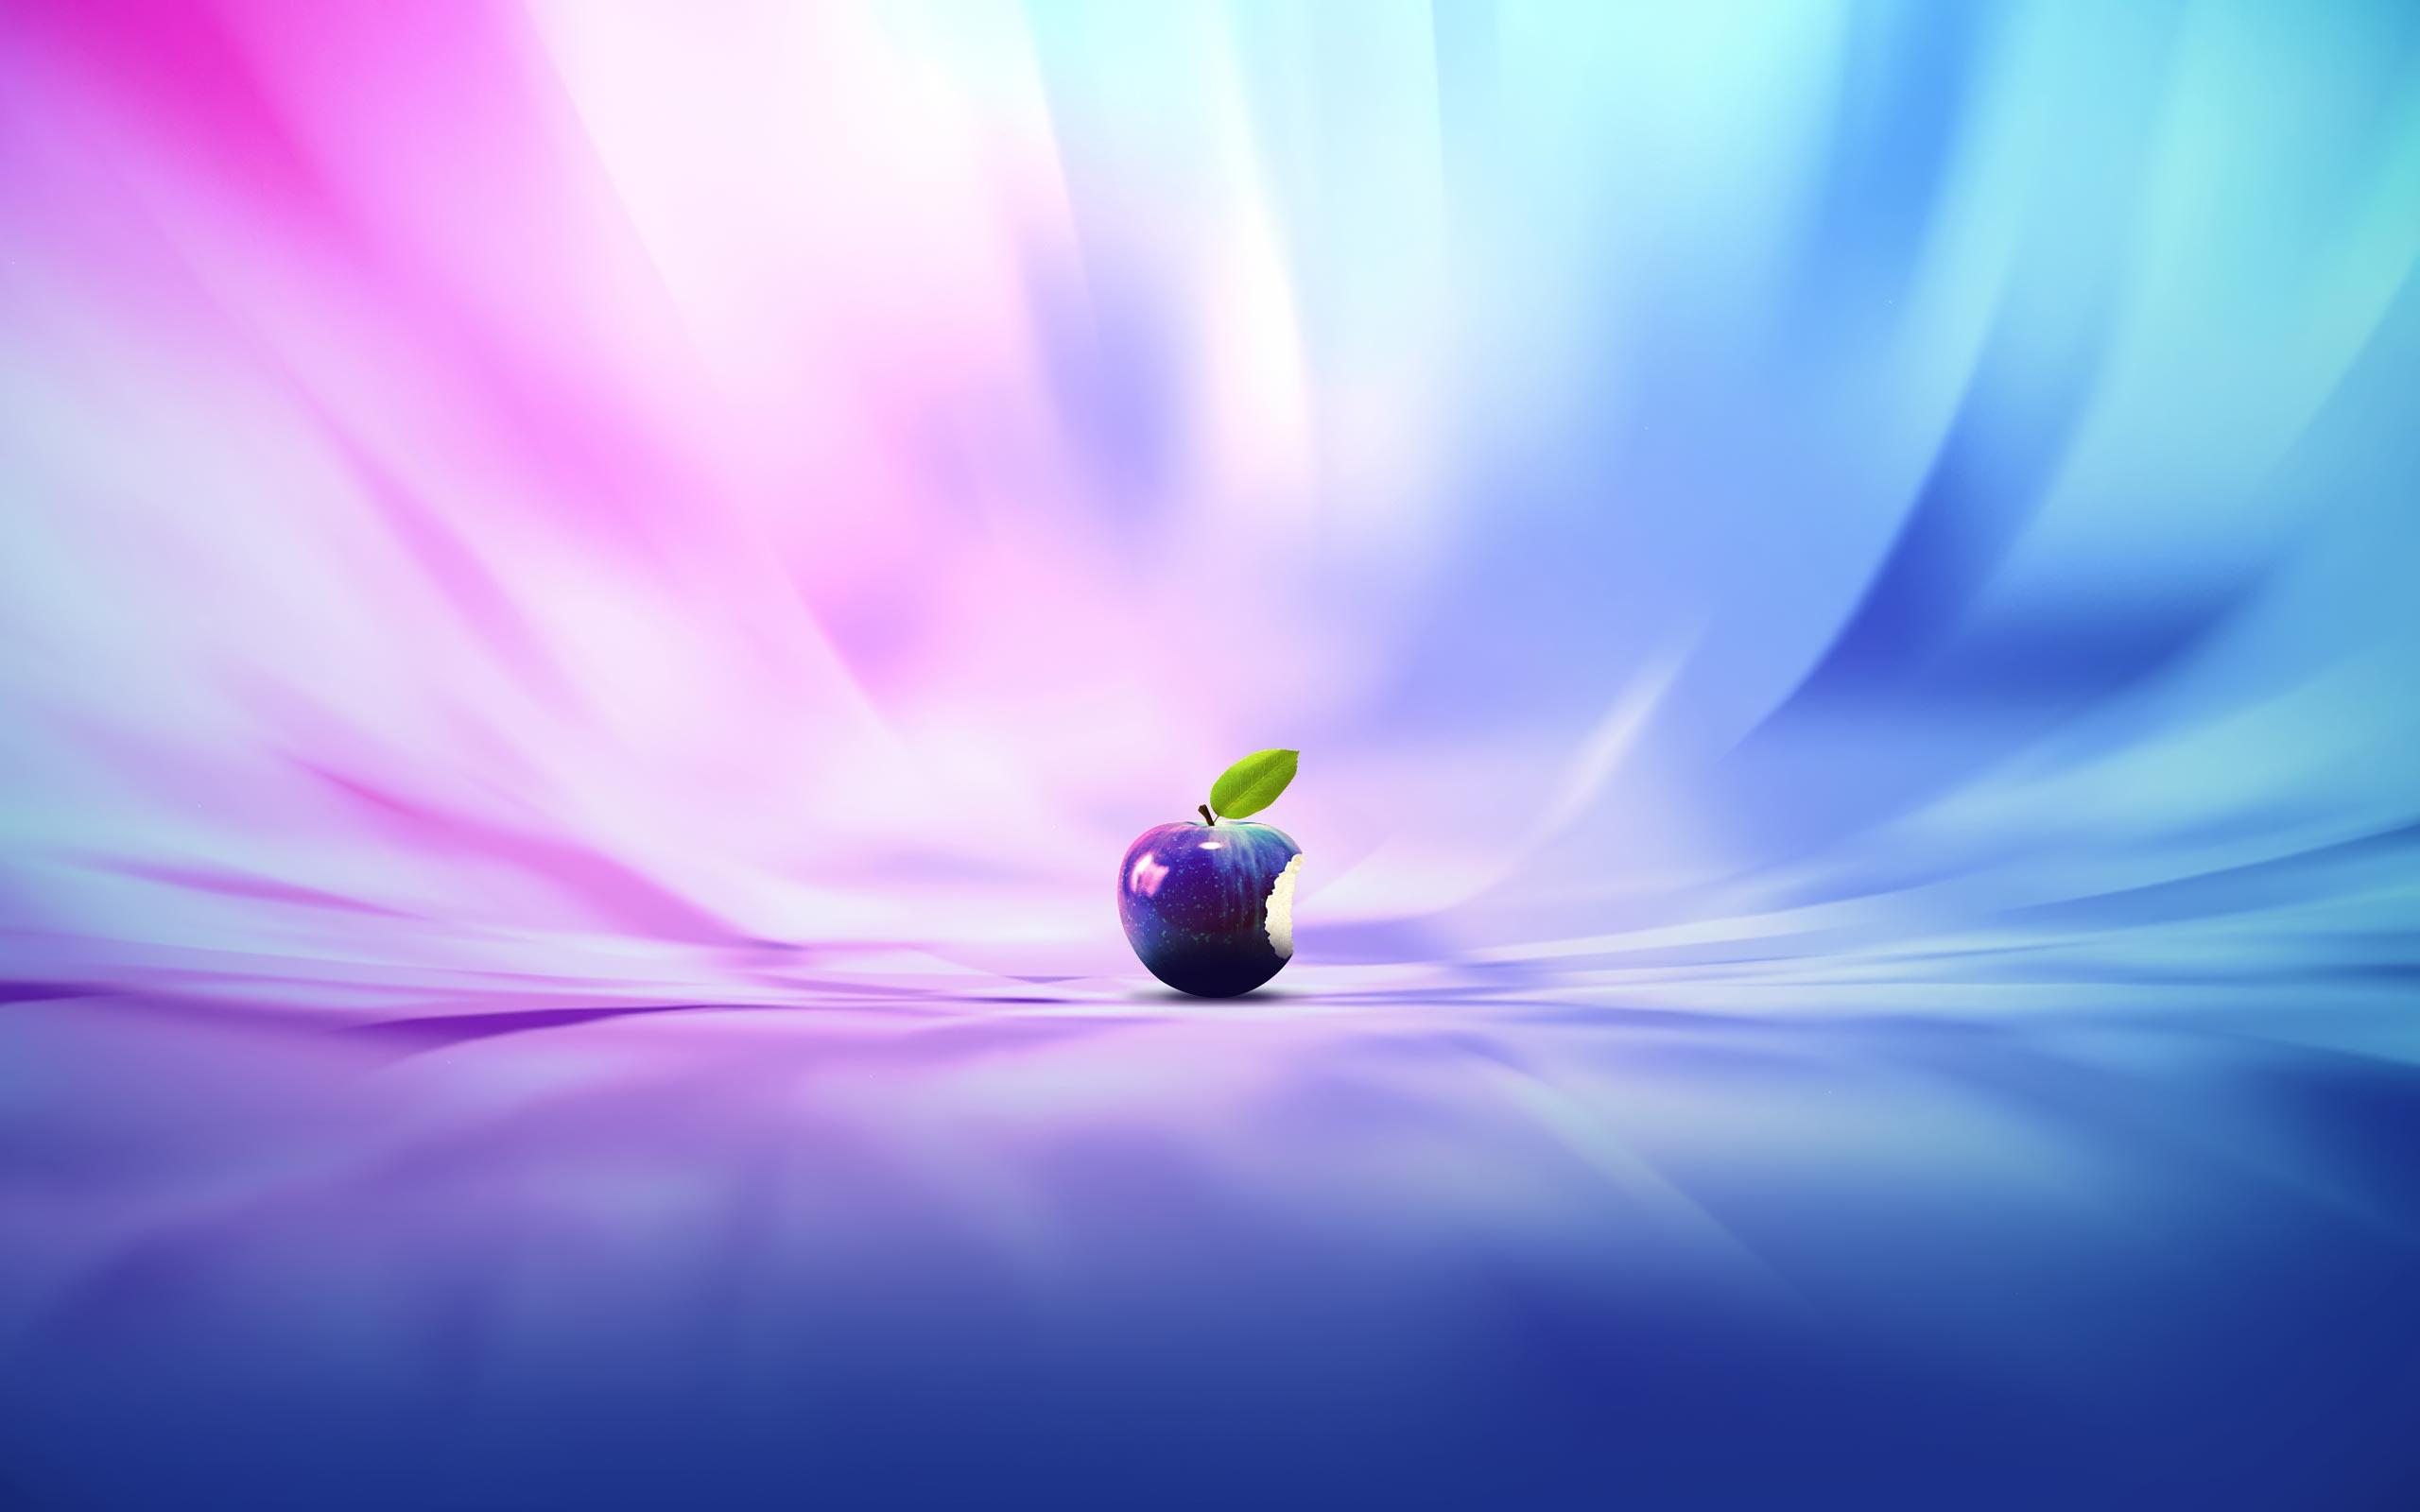 Apple MacBook Pro wallpaper High Quality WallpapersWallpaper 2560x1600